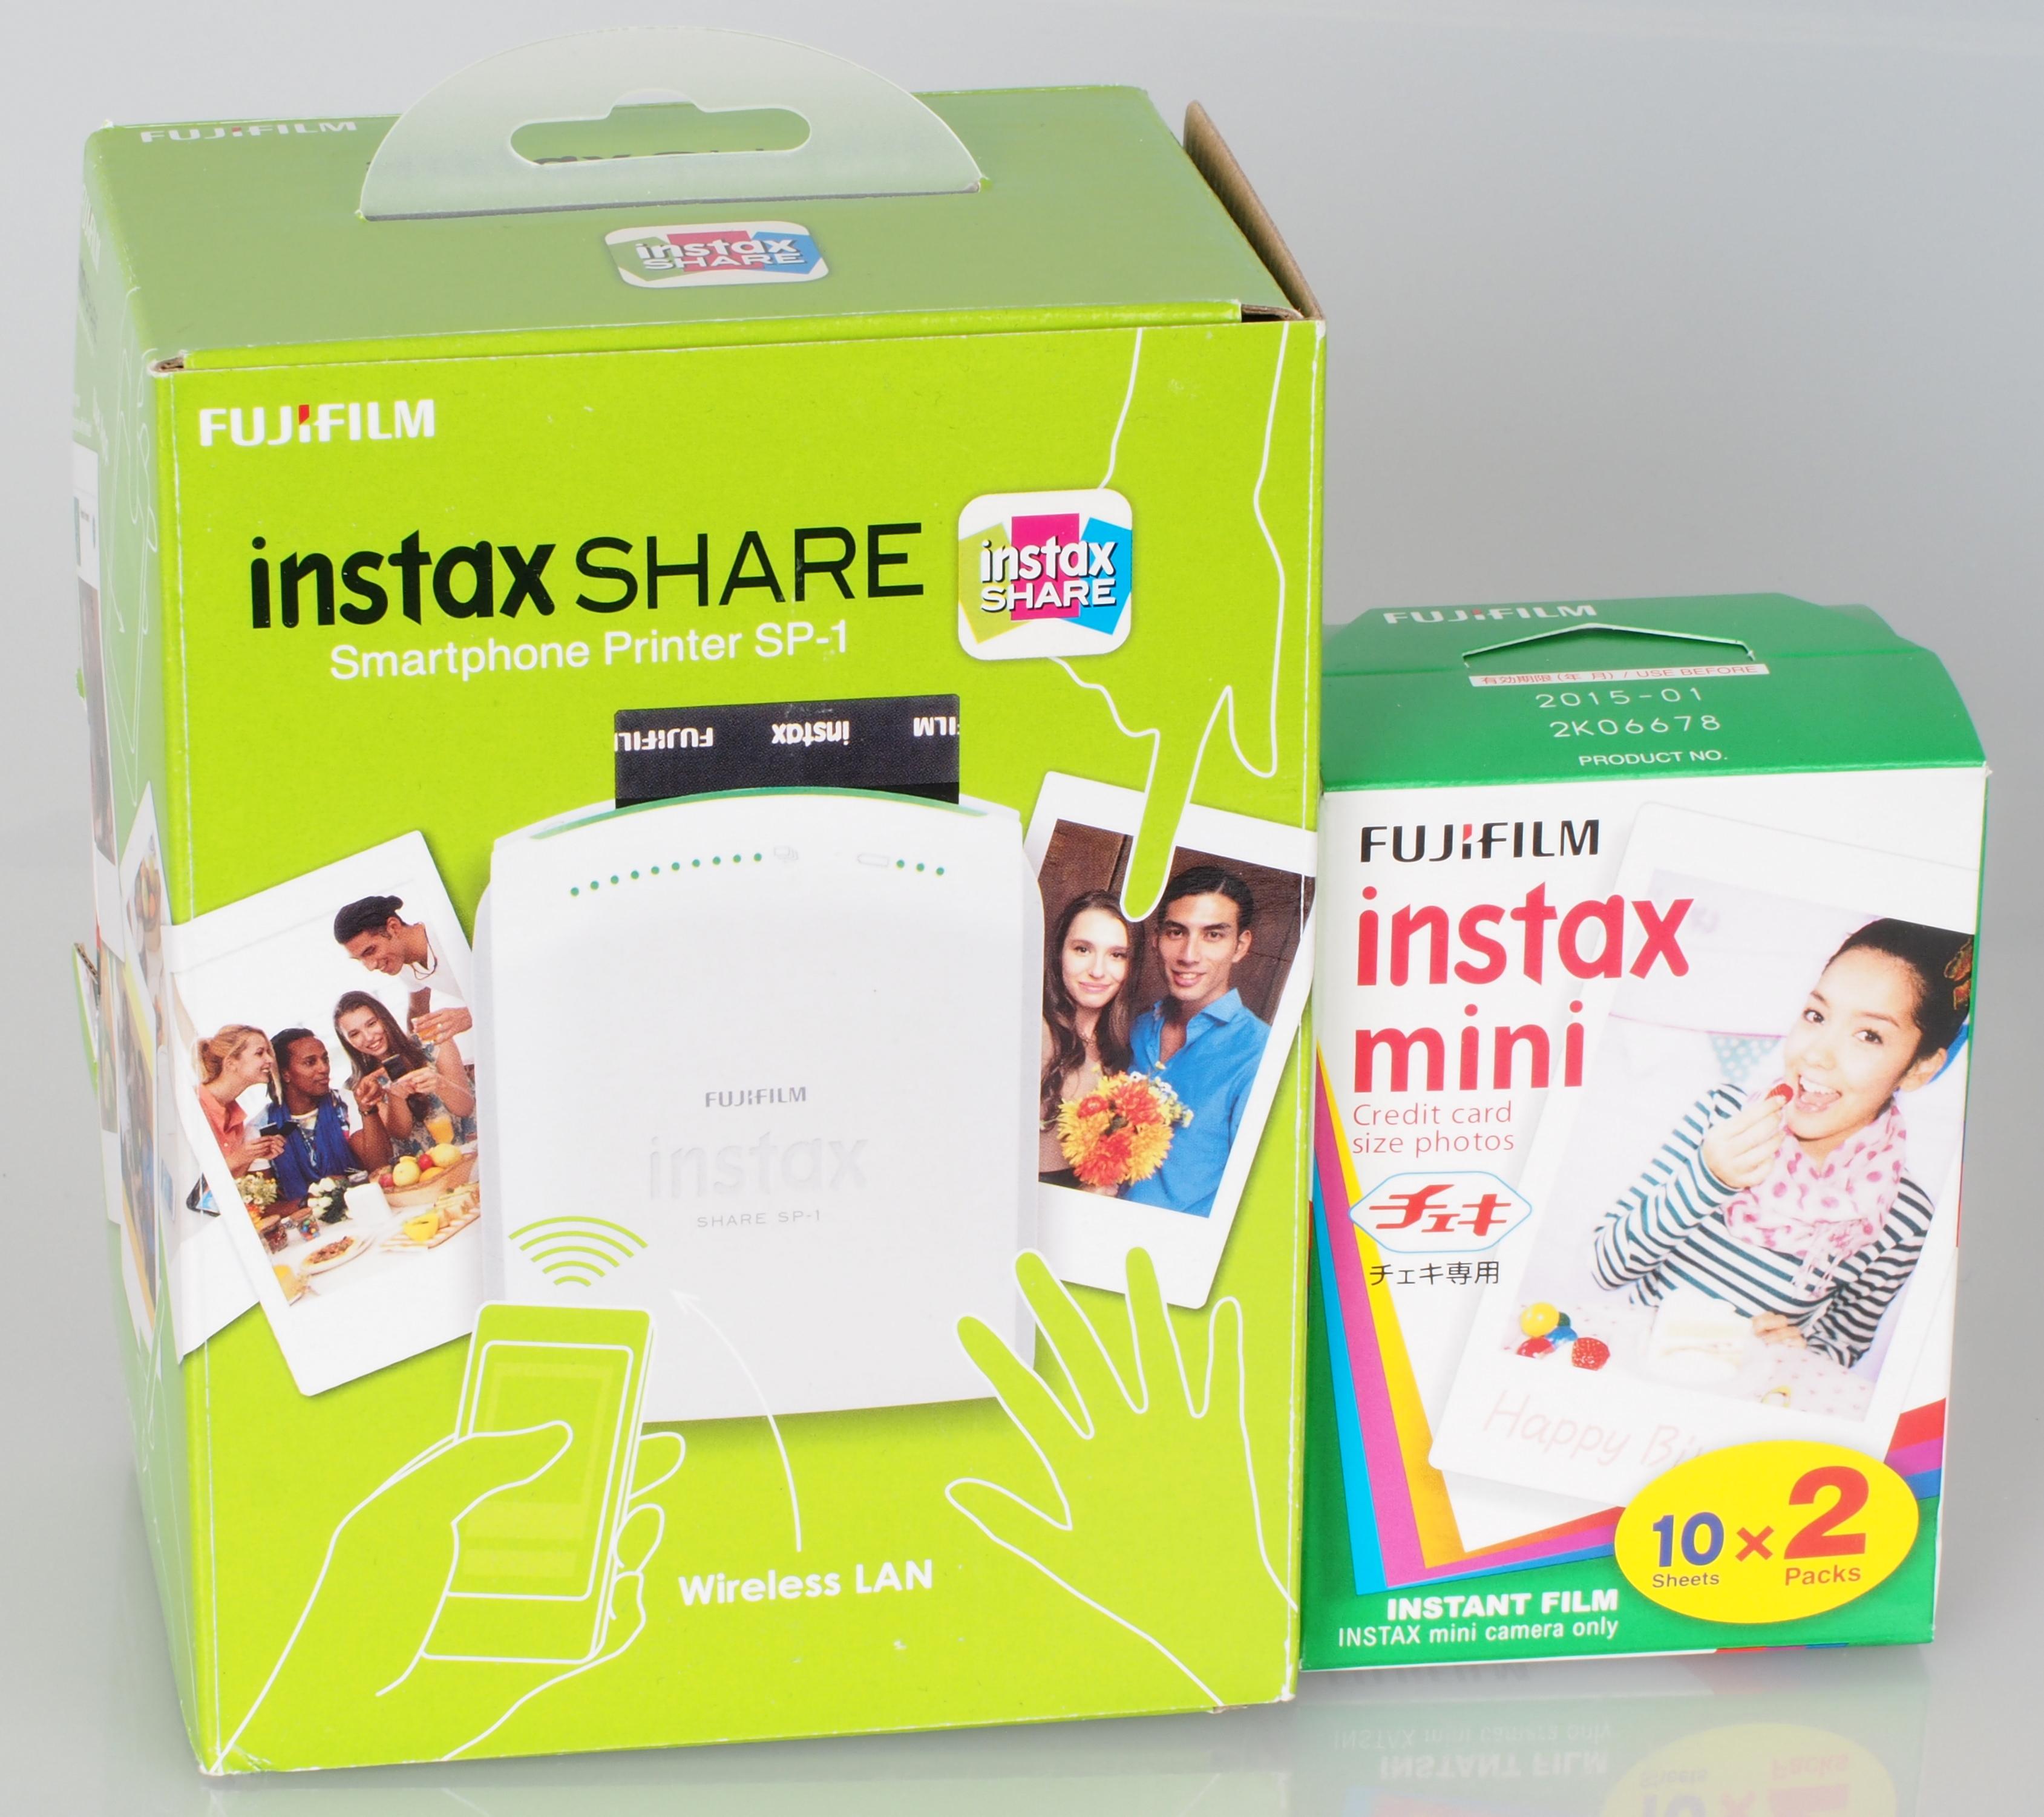 Amazon.com : Fujifilm Instax SP-3 Mobile Printer - White ...